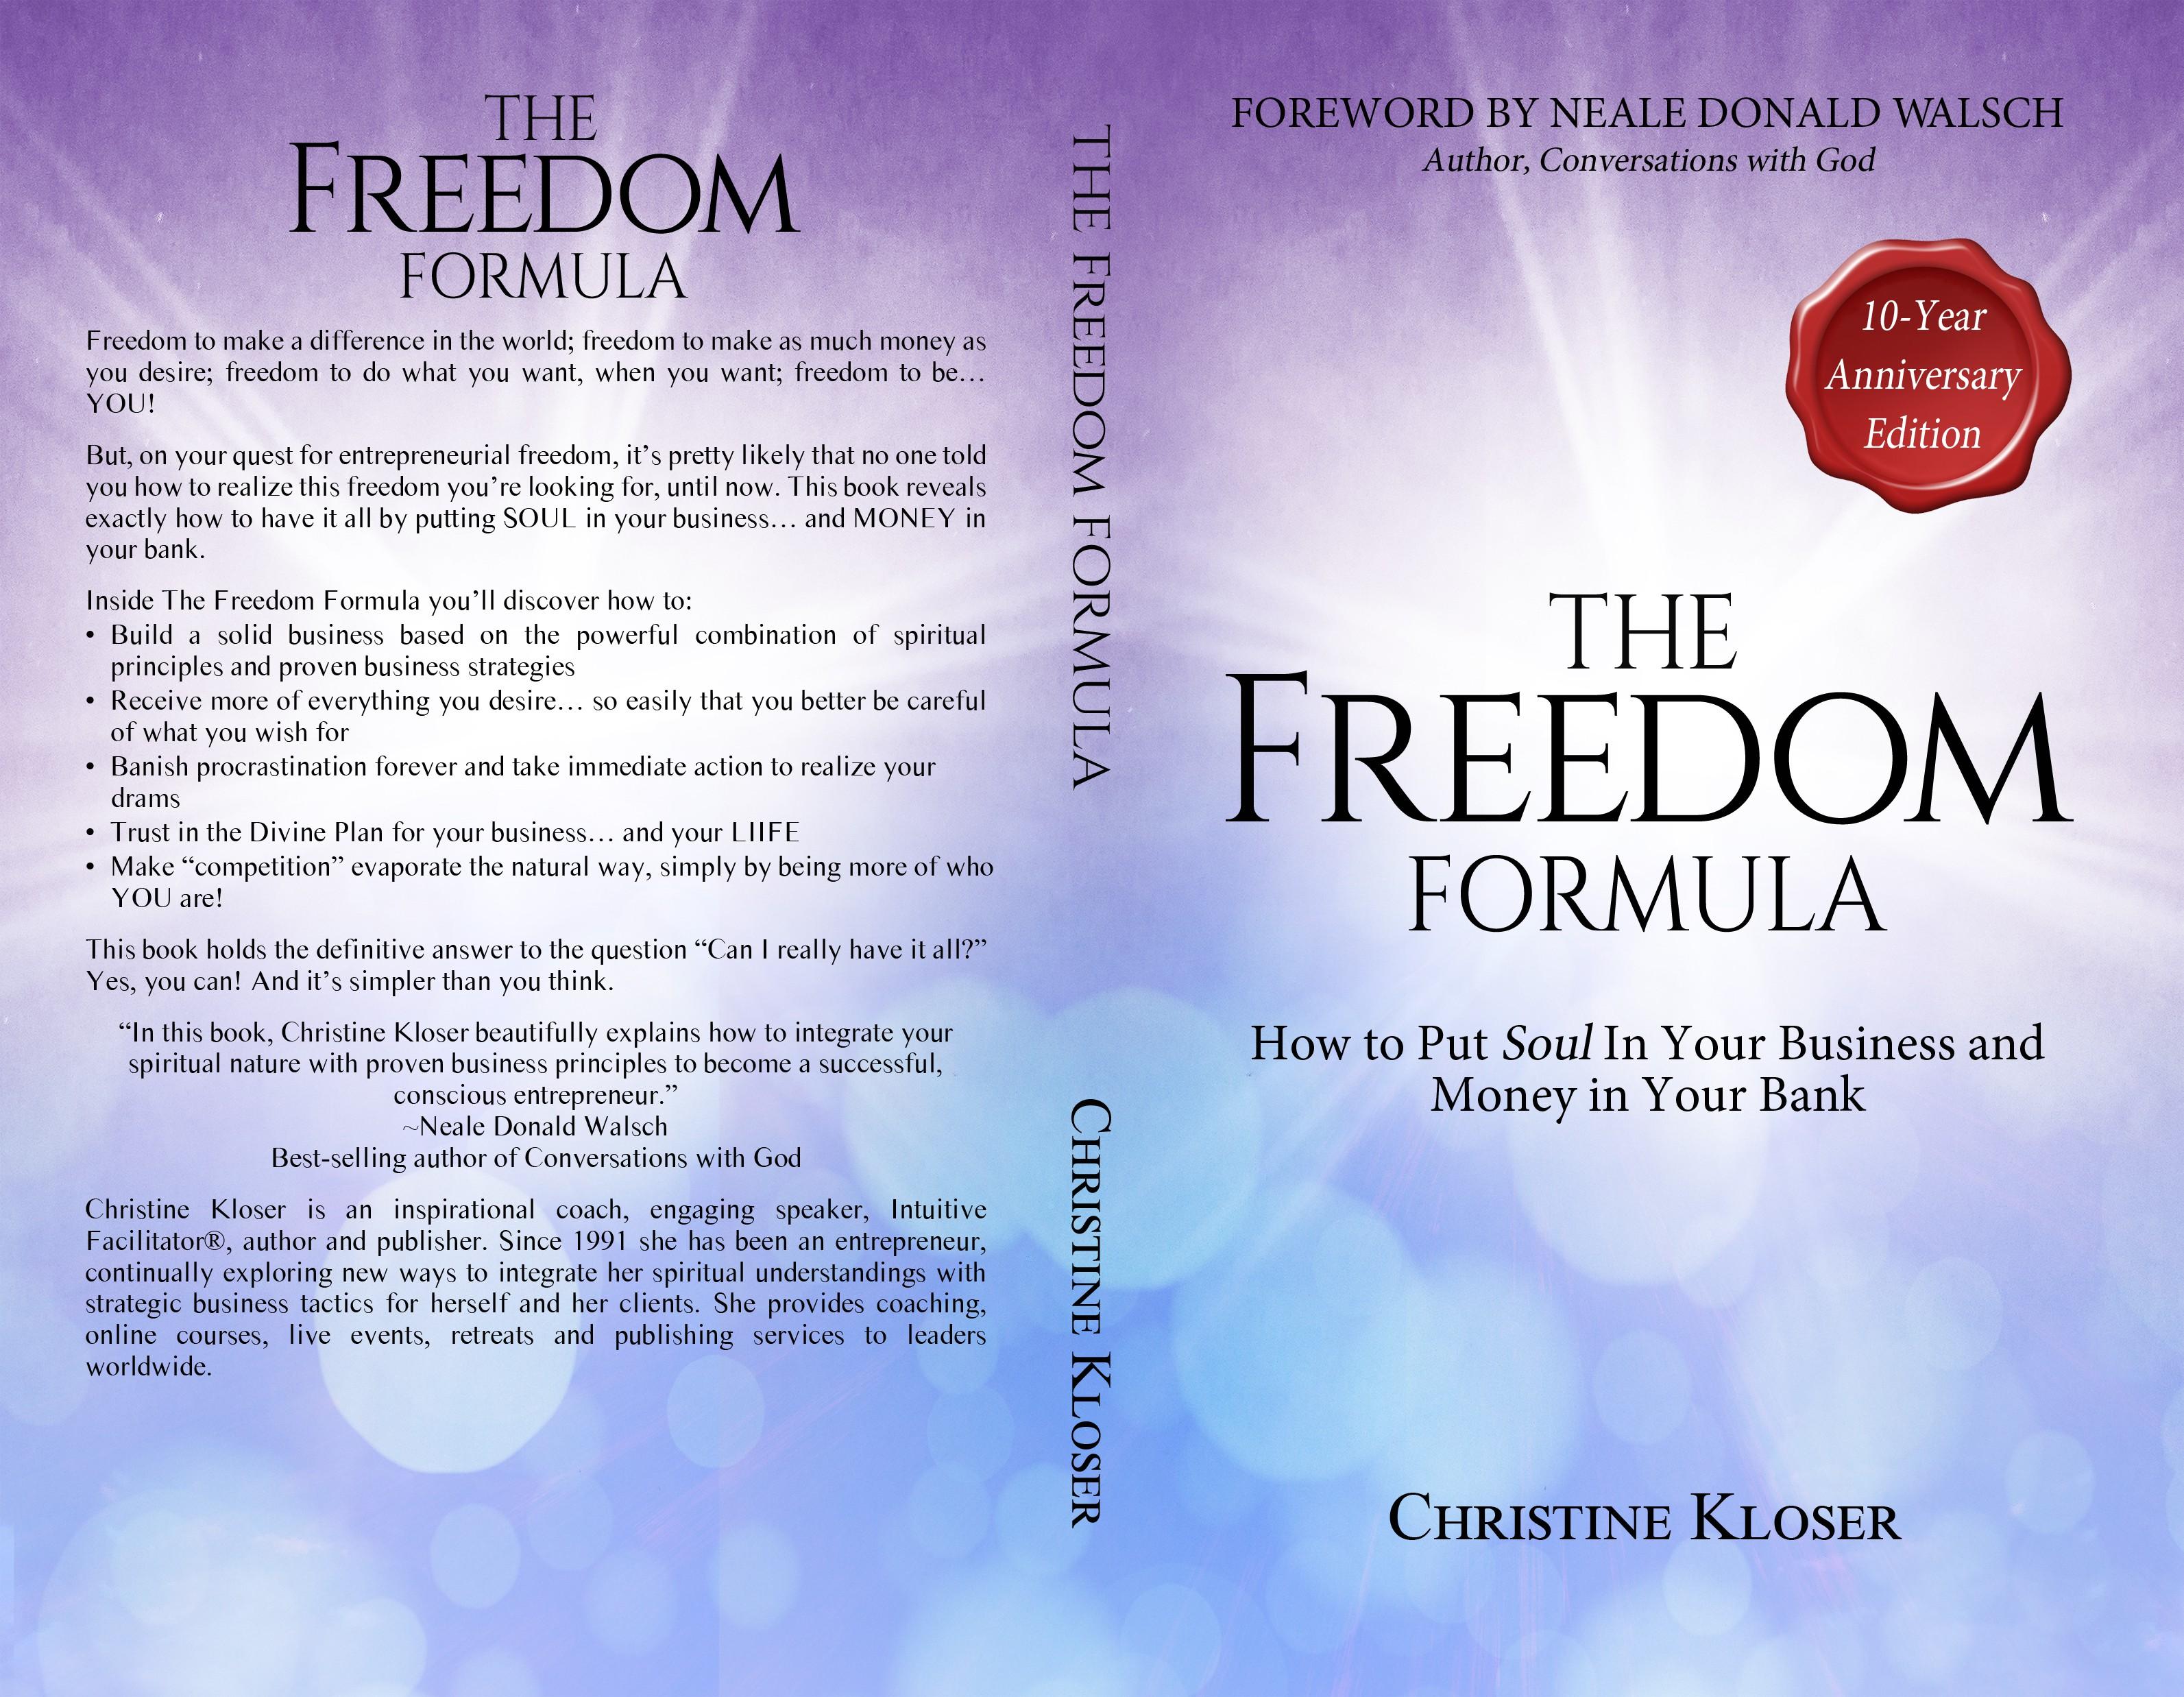 Book Cover Design - 10 Year Anniversary Update